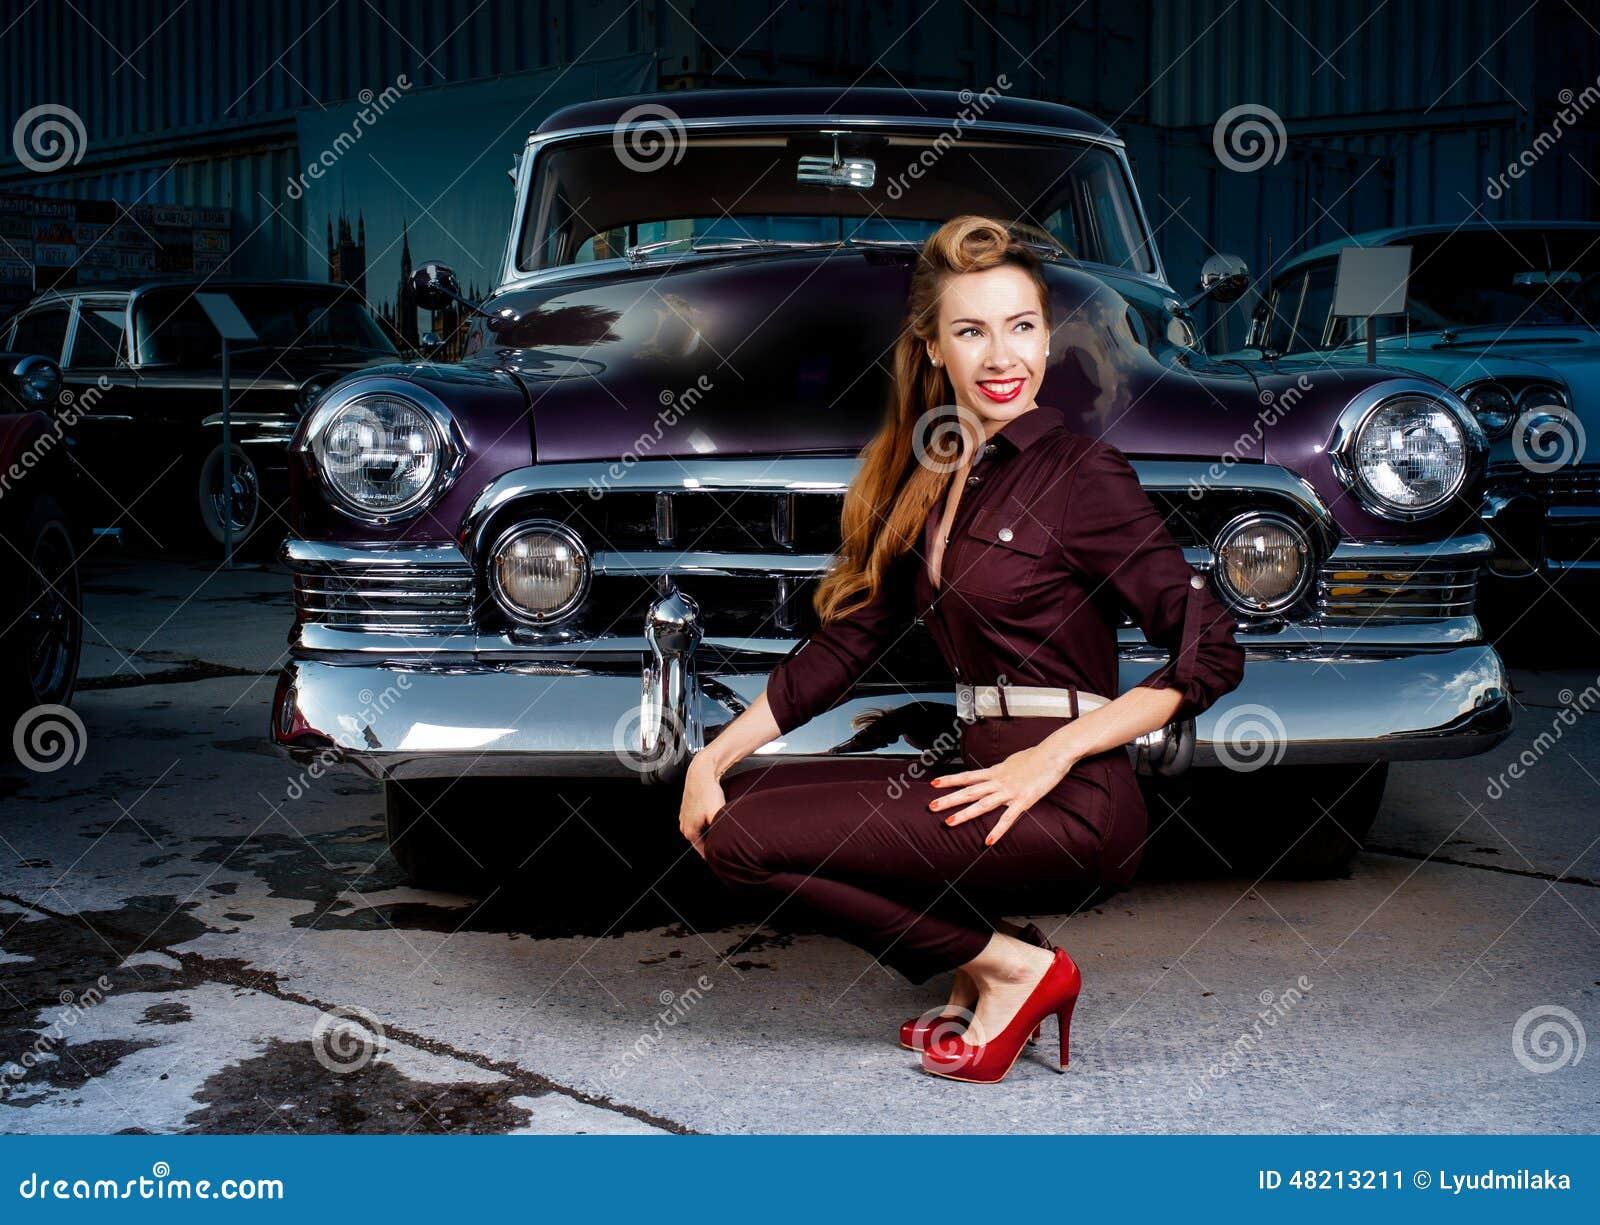 Pin Up Girl In Retro Car Stock Photo Image 48213211